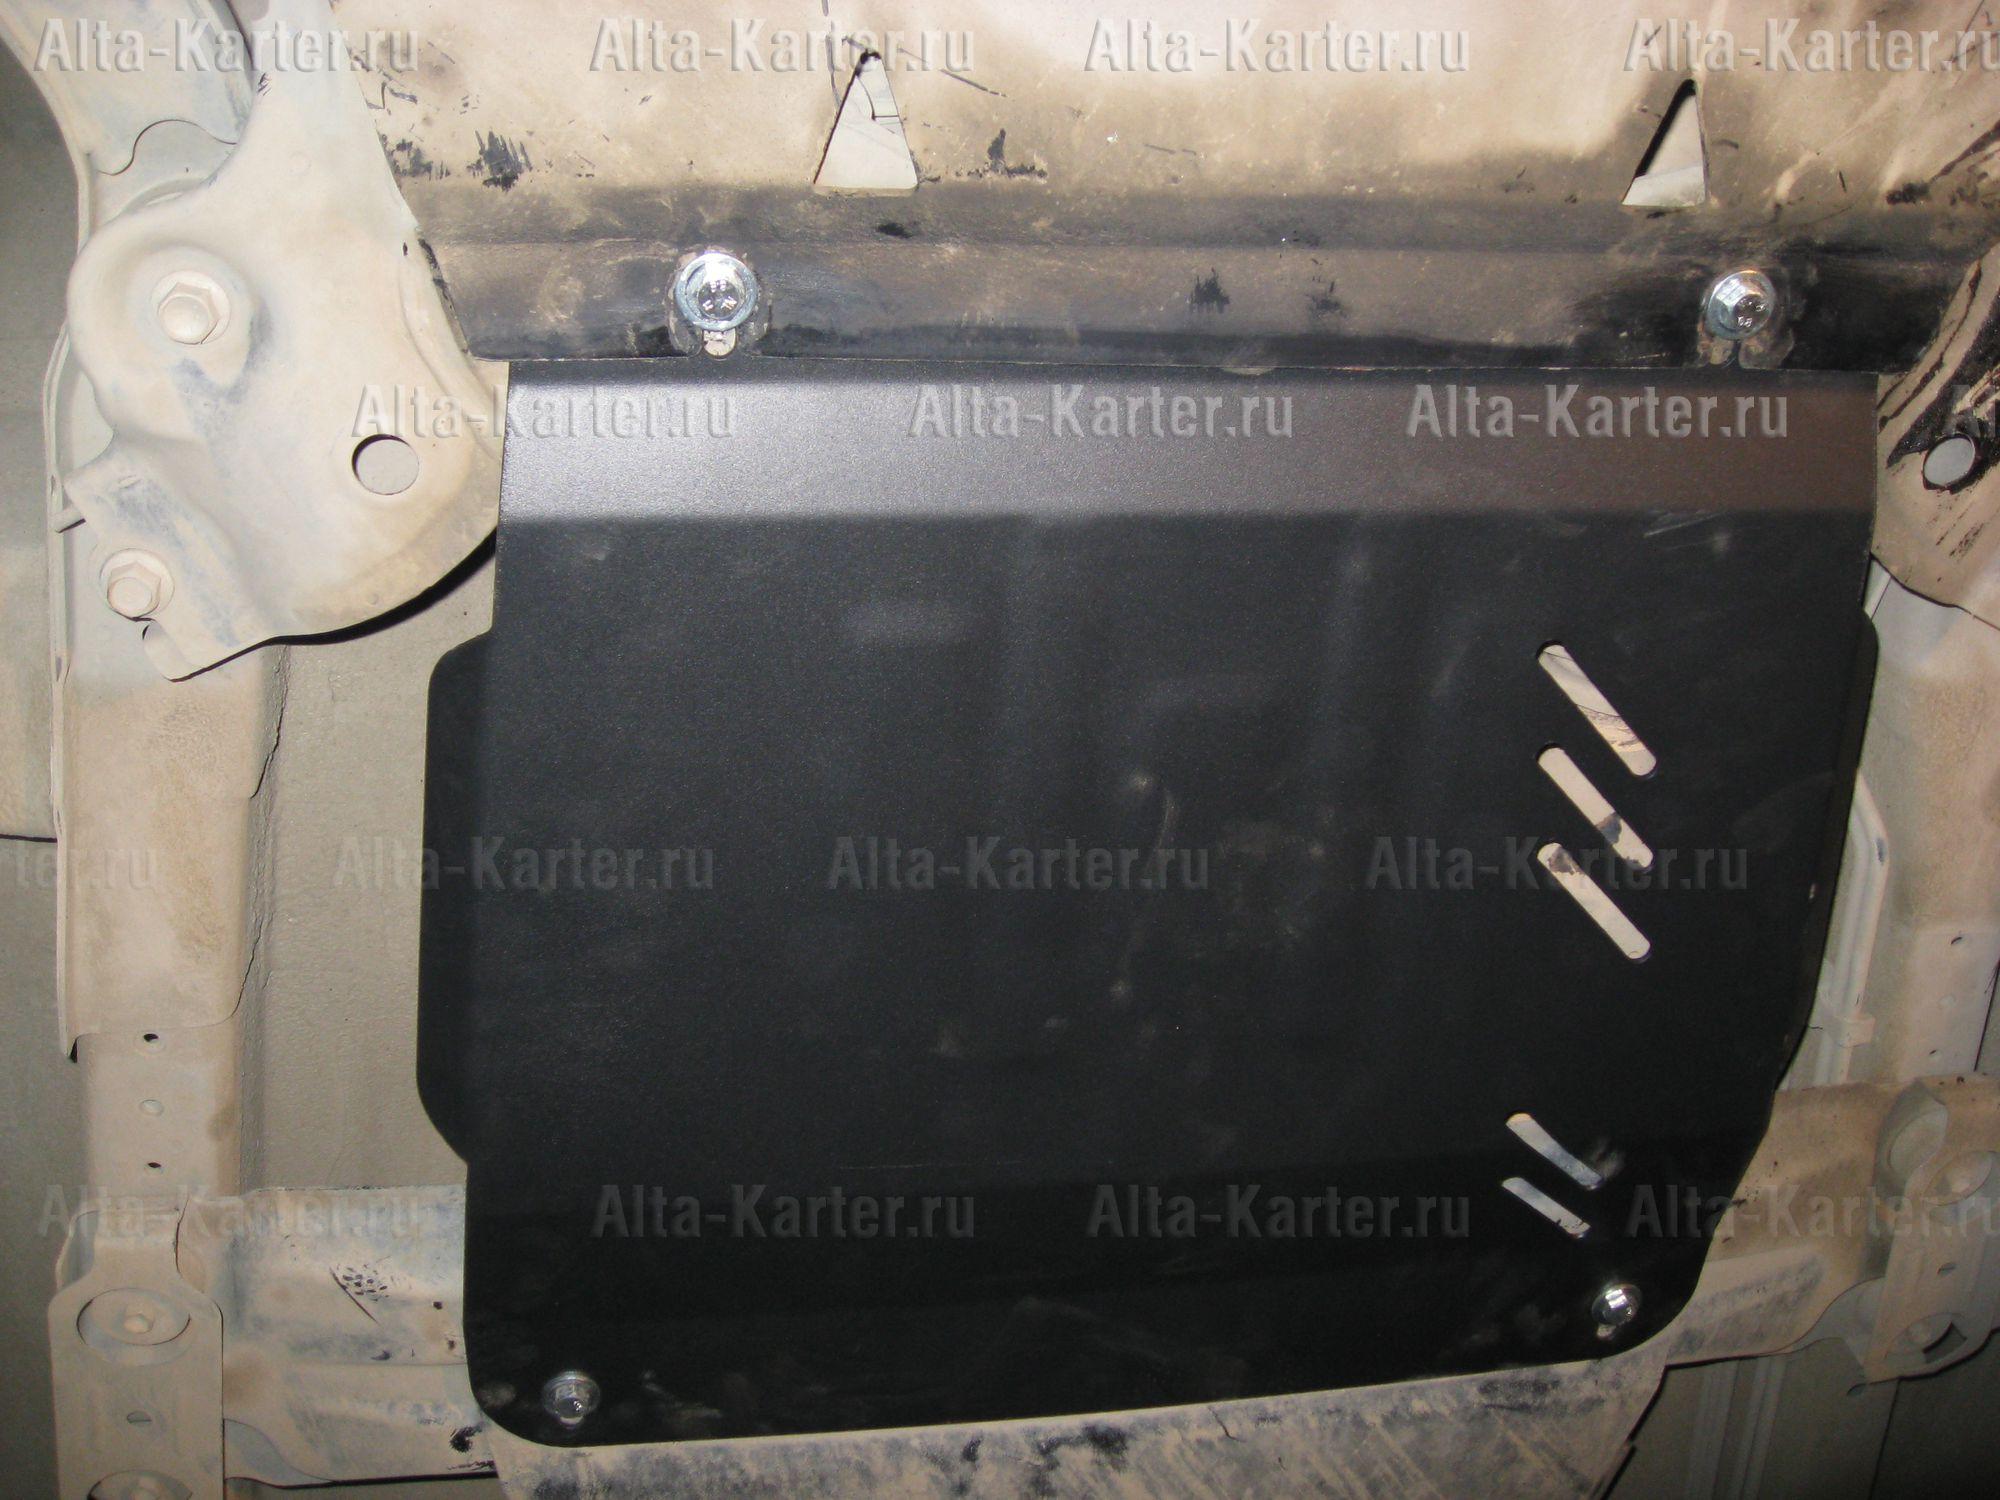 Защита Alfeco для КПП Suzuki Grand Vitara II 2005-2015. Артикул ALF.23.02